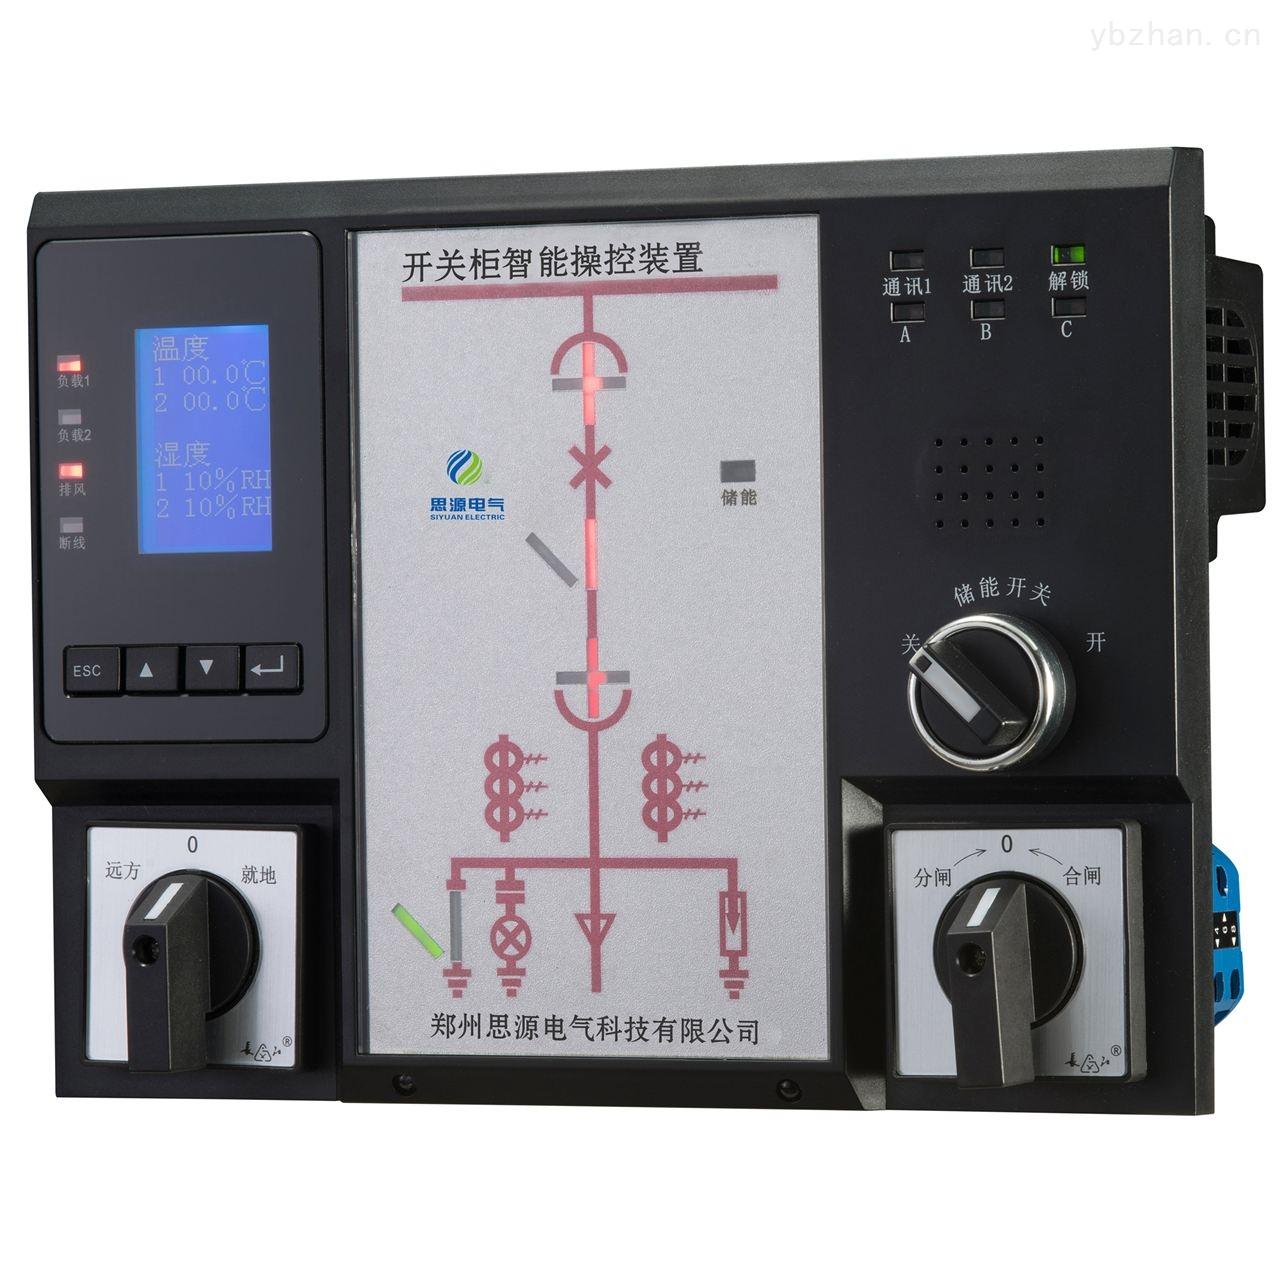 HS105,HS105A智能操控装置